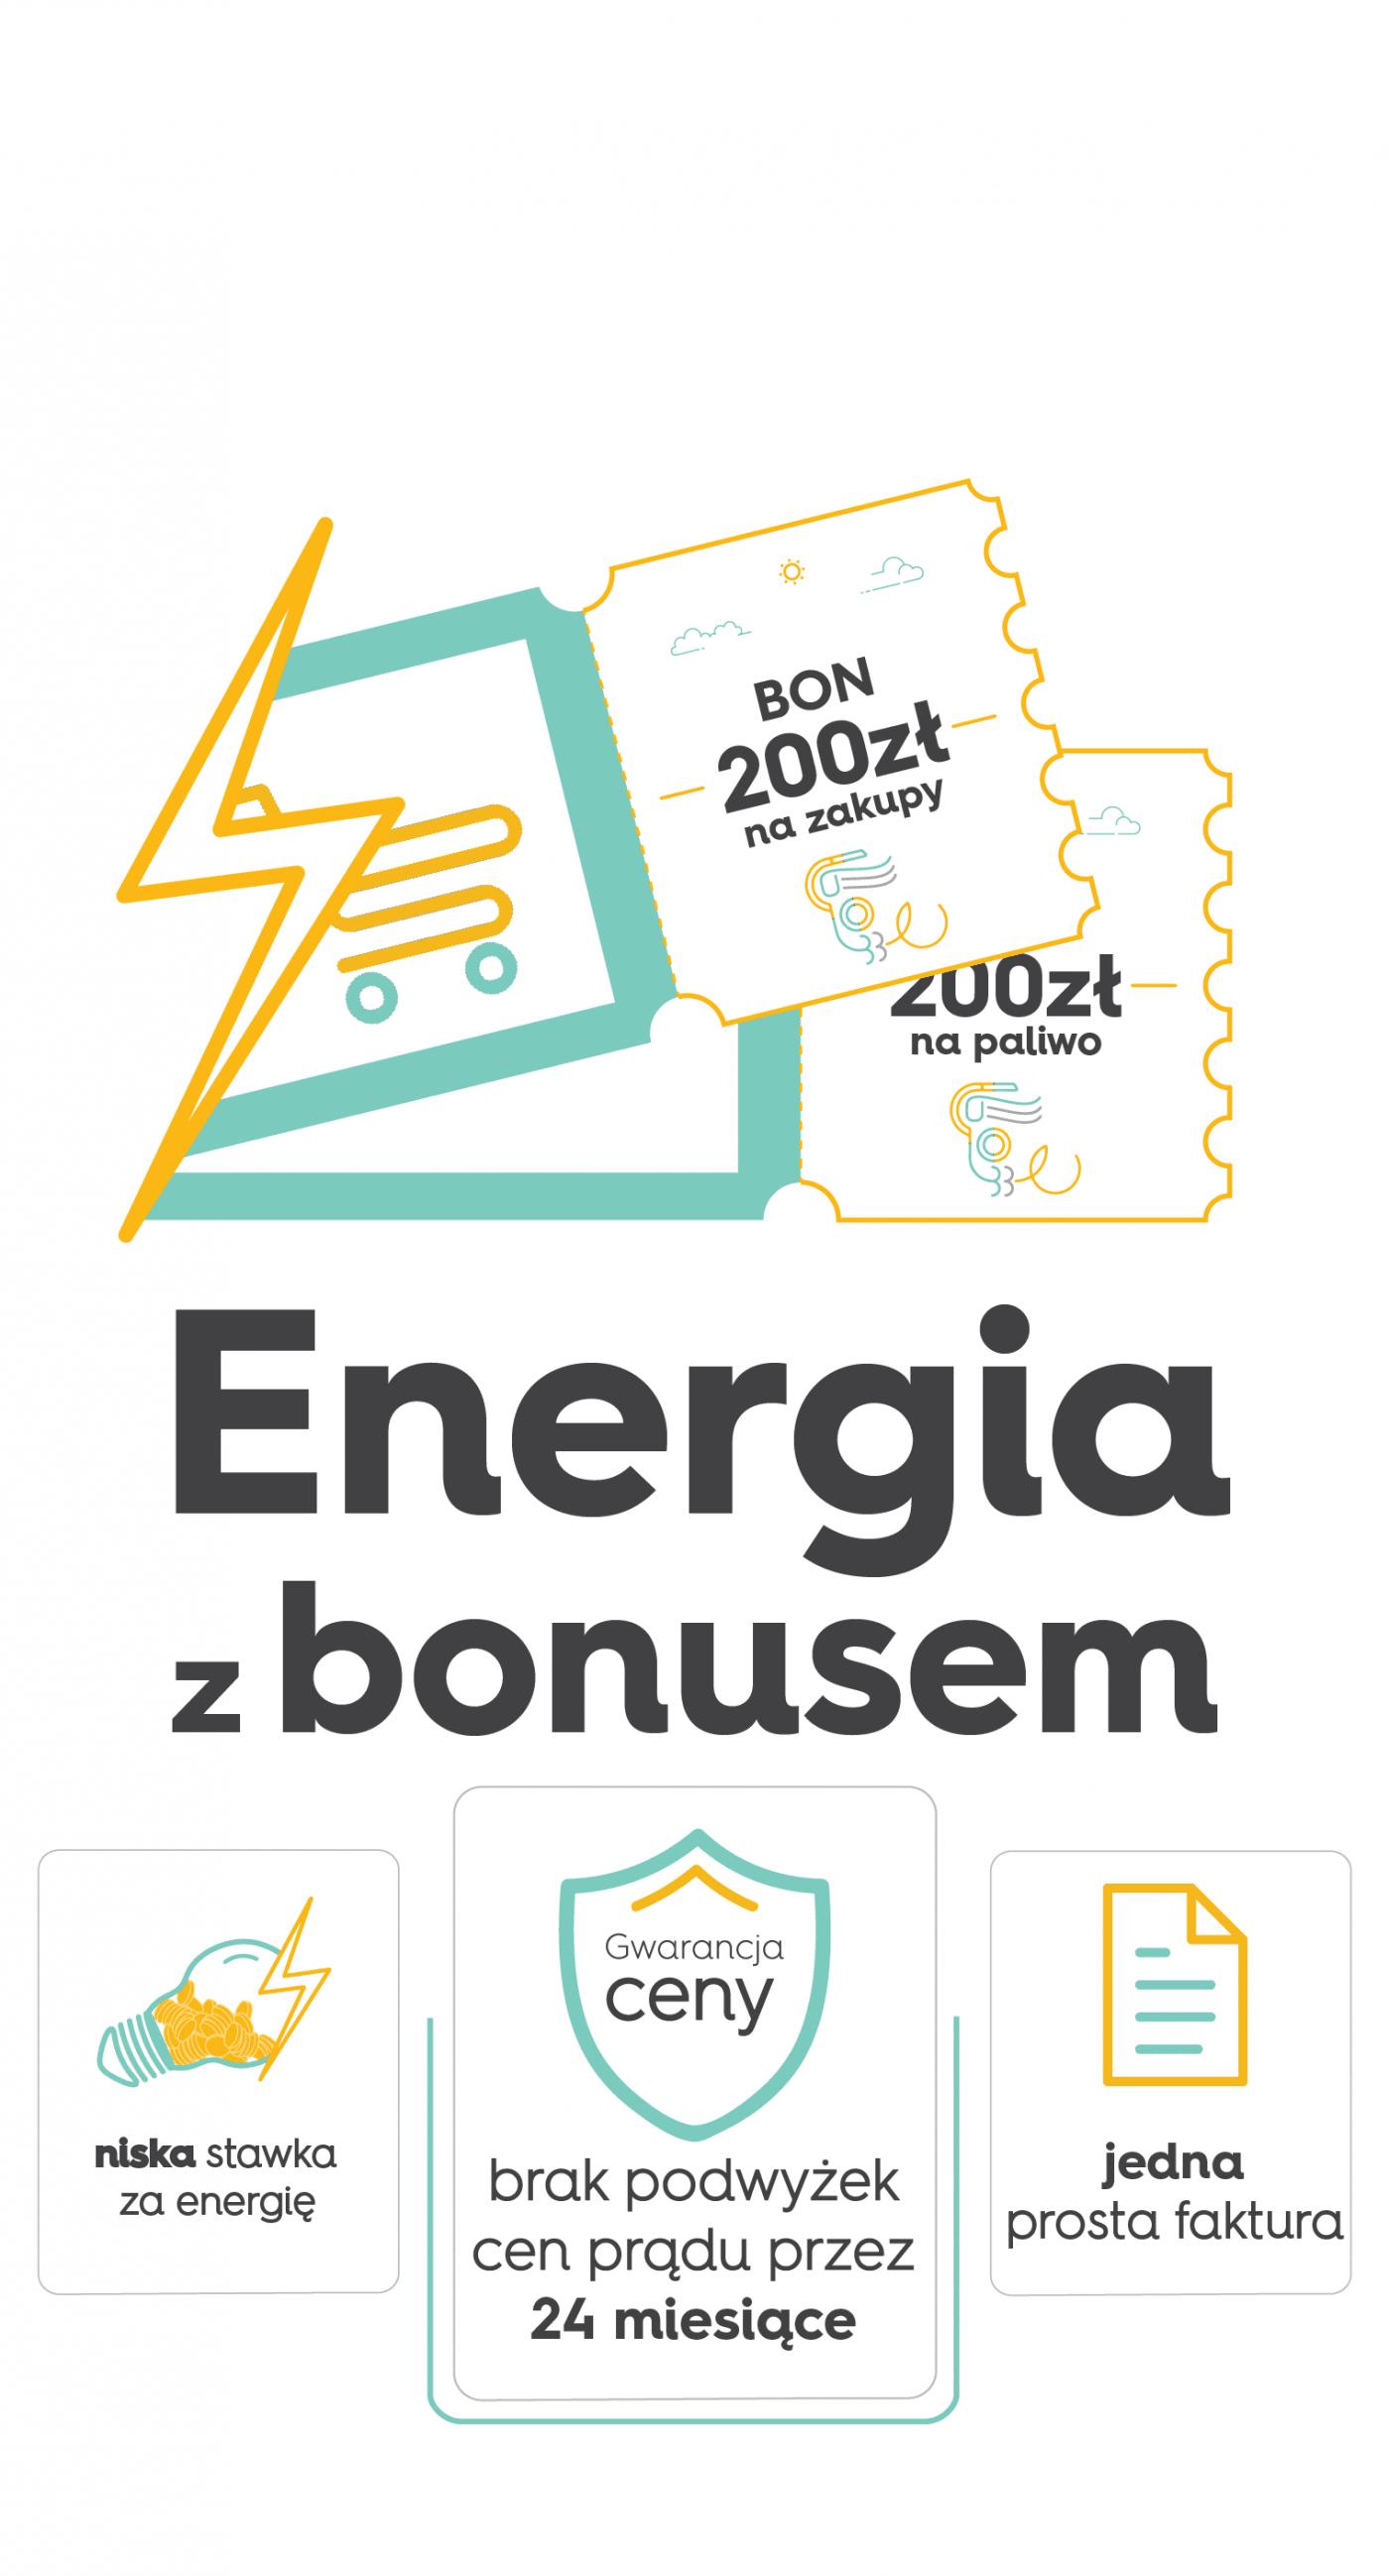 energia-z-bomnusem-20.png